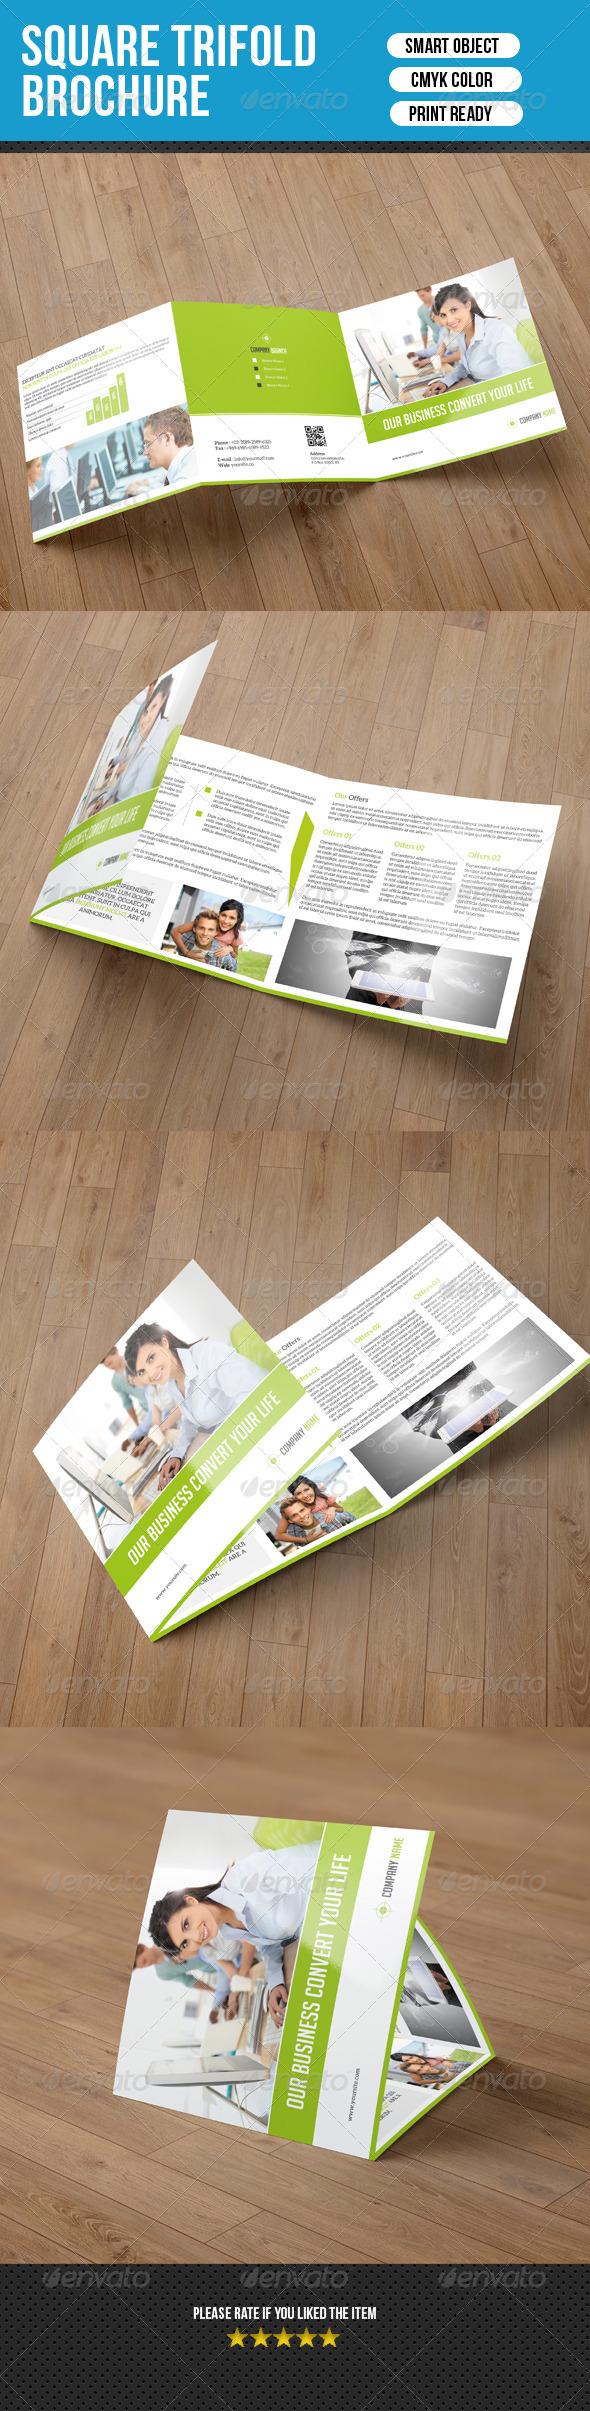 GraphicRiver Square Trifold Brochure-Business 7591891